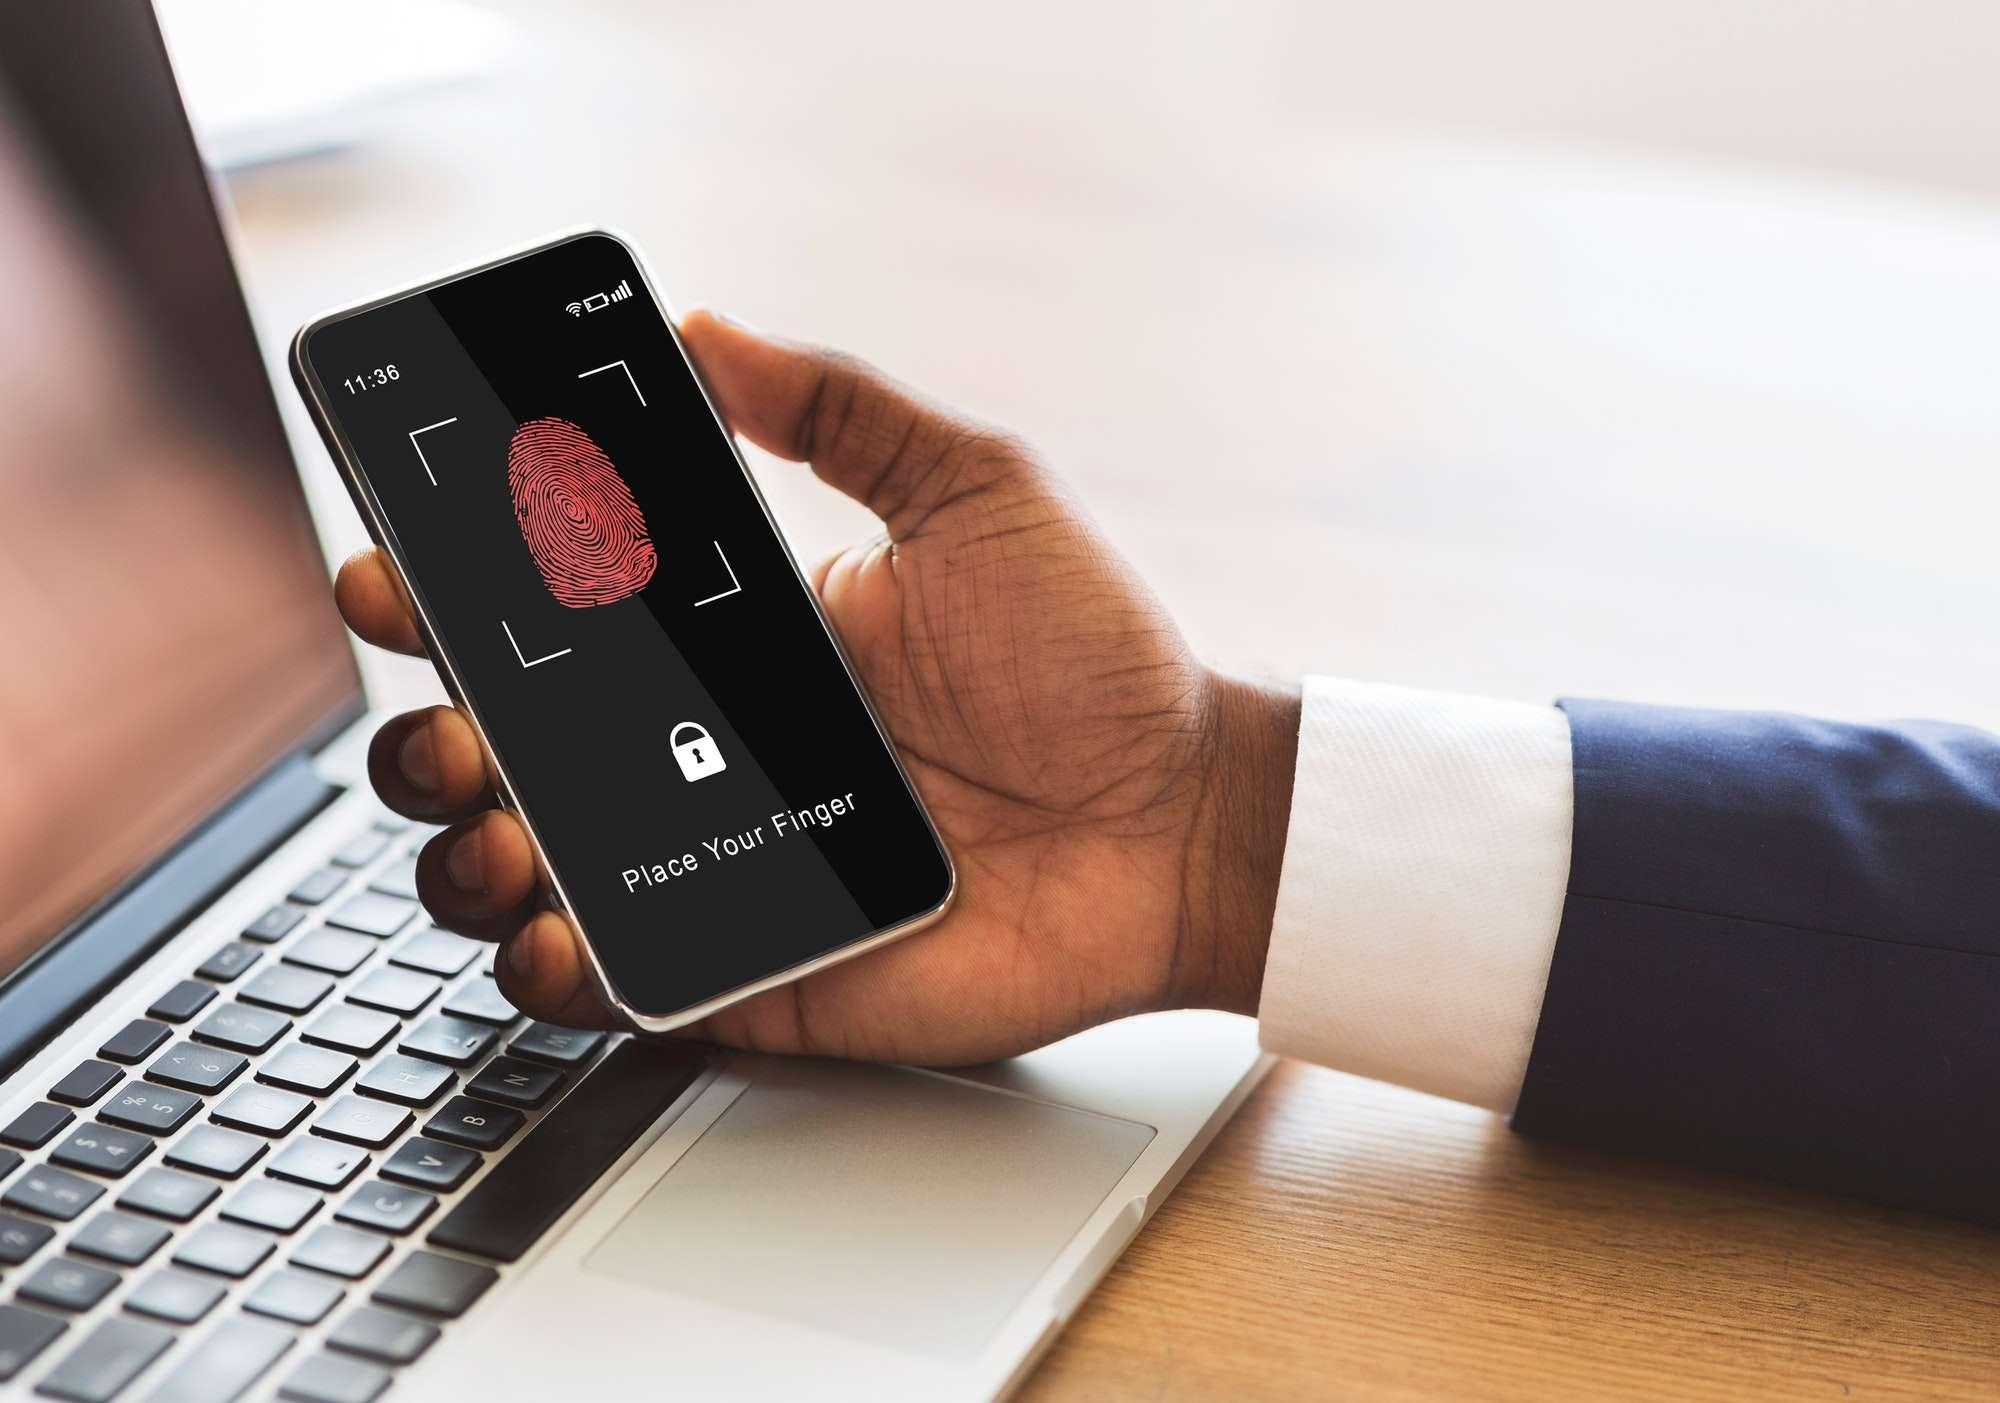 Man holding phone with fingerprint scanning smartphone app